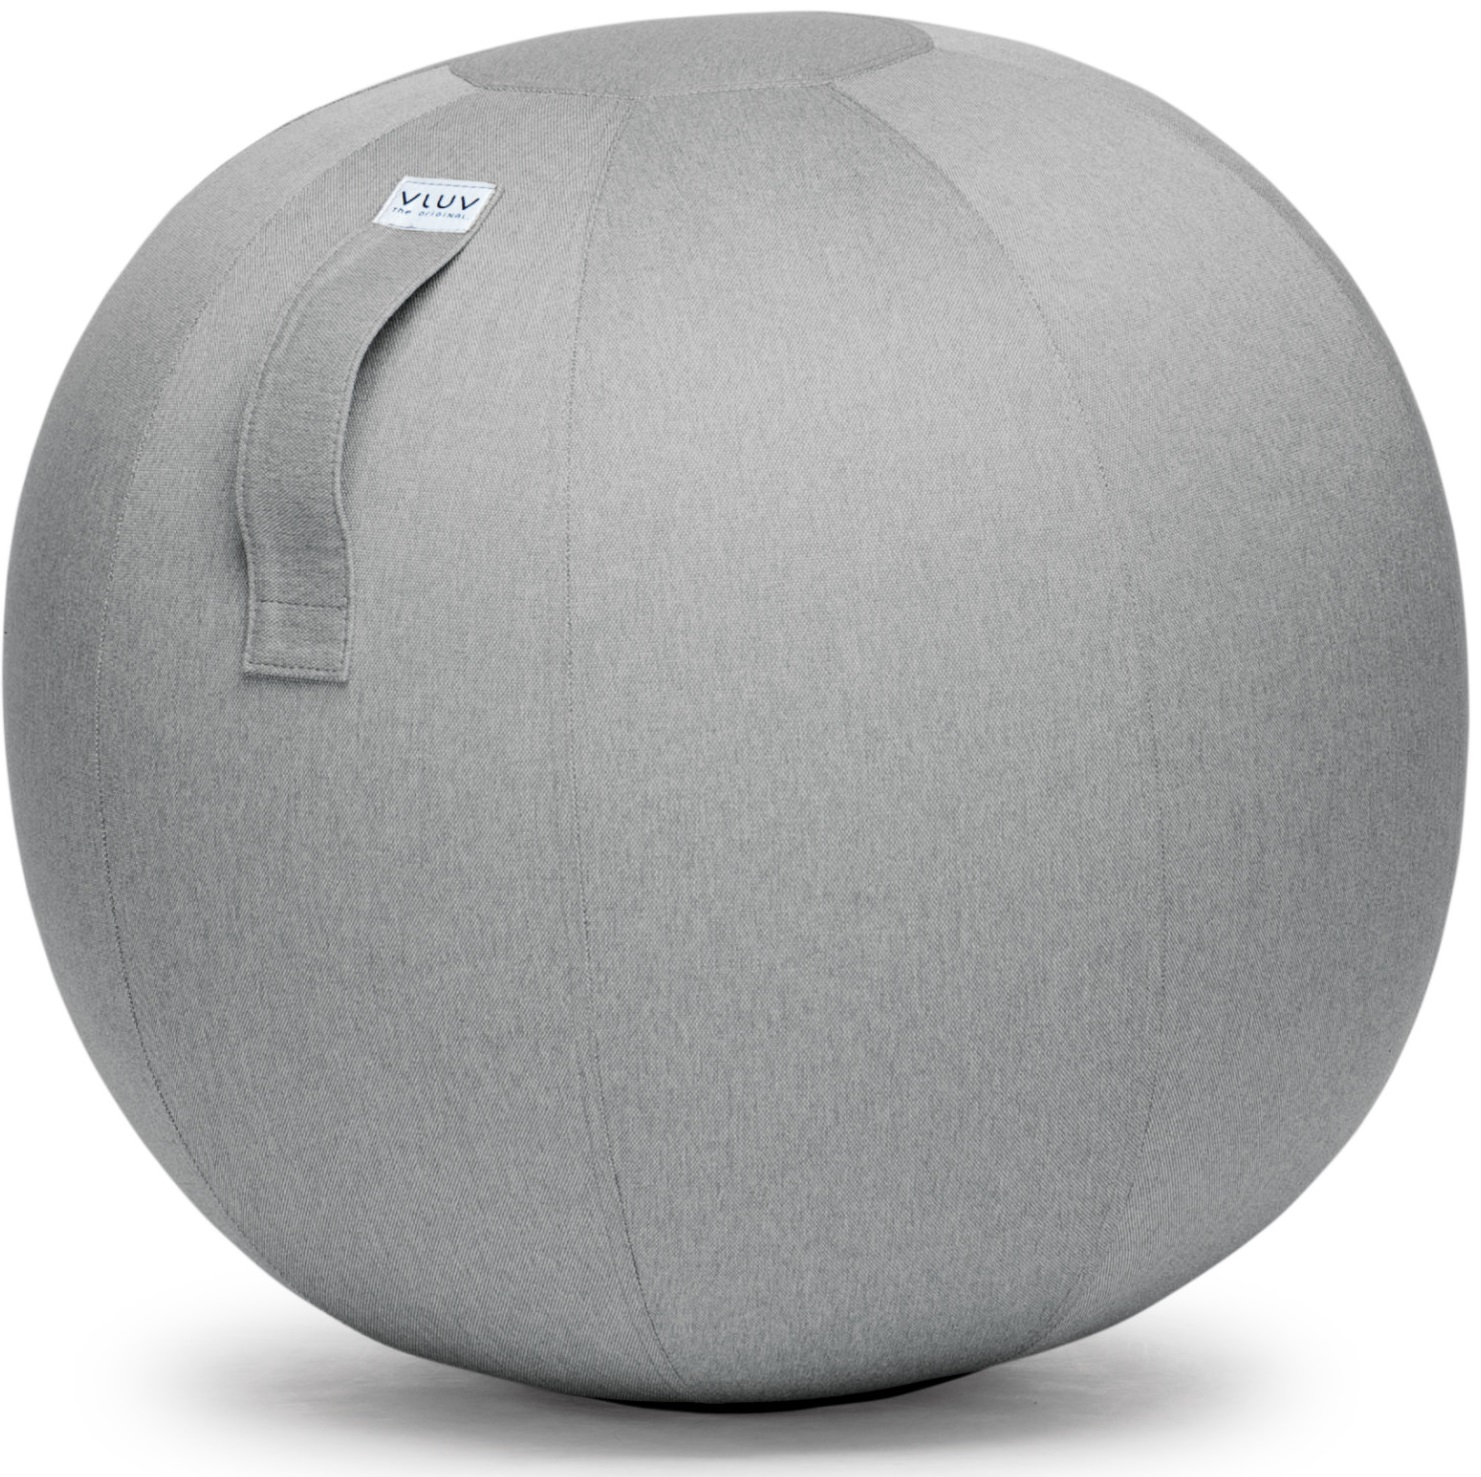 Vluv Zitbal Silver Grey 60-65cm